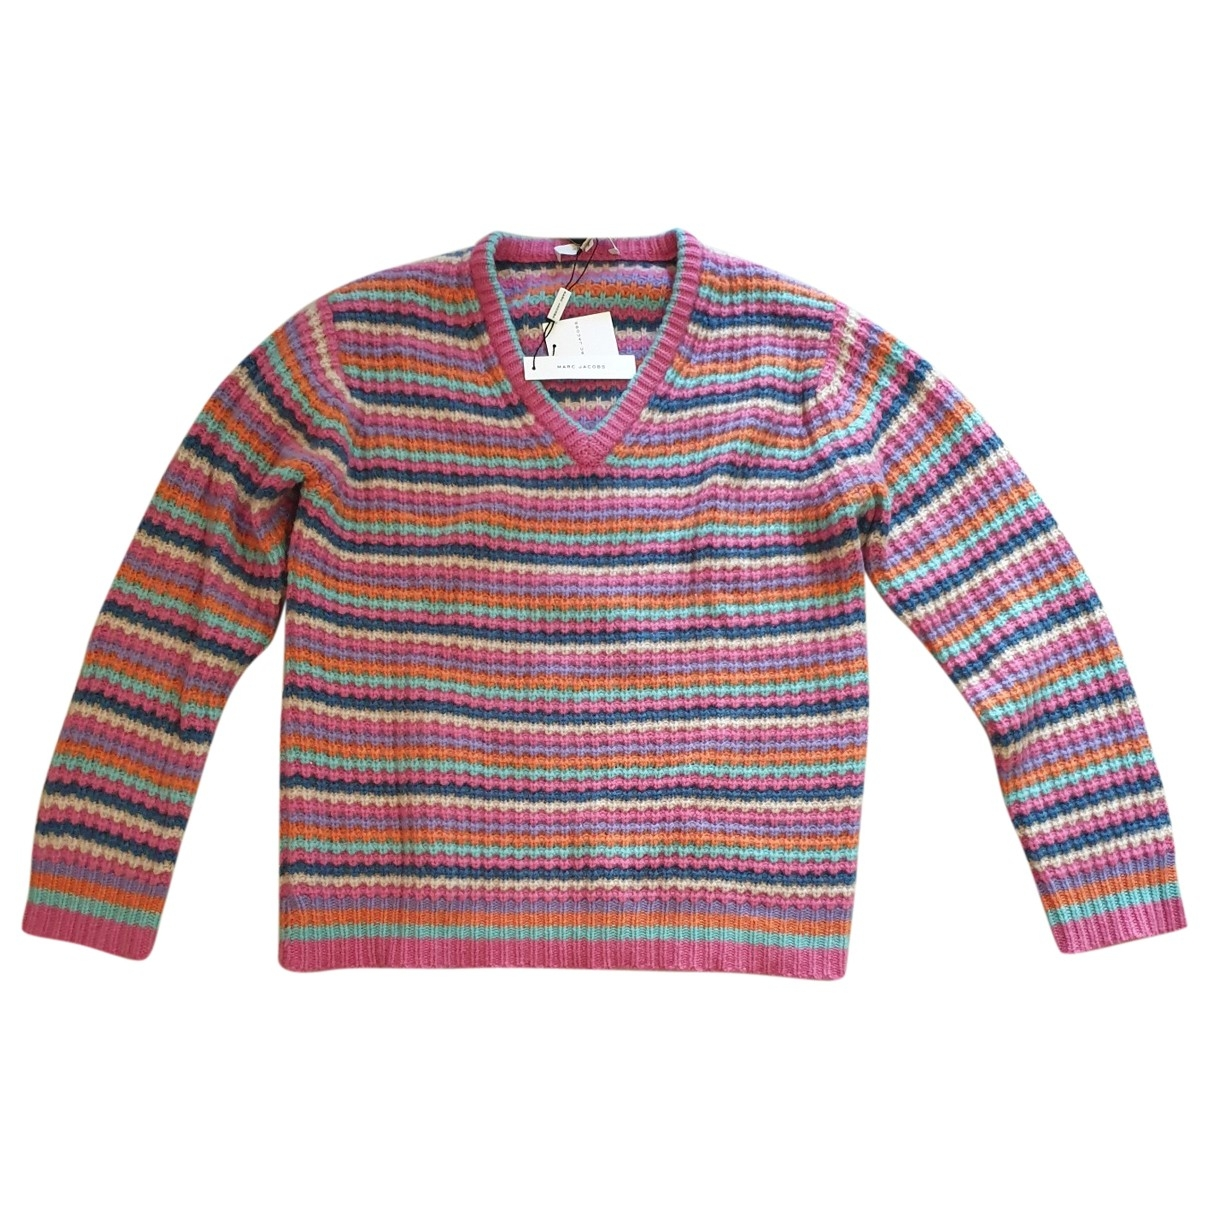 Marc Jacobs \N Pullover in  Bunt Kaschmir